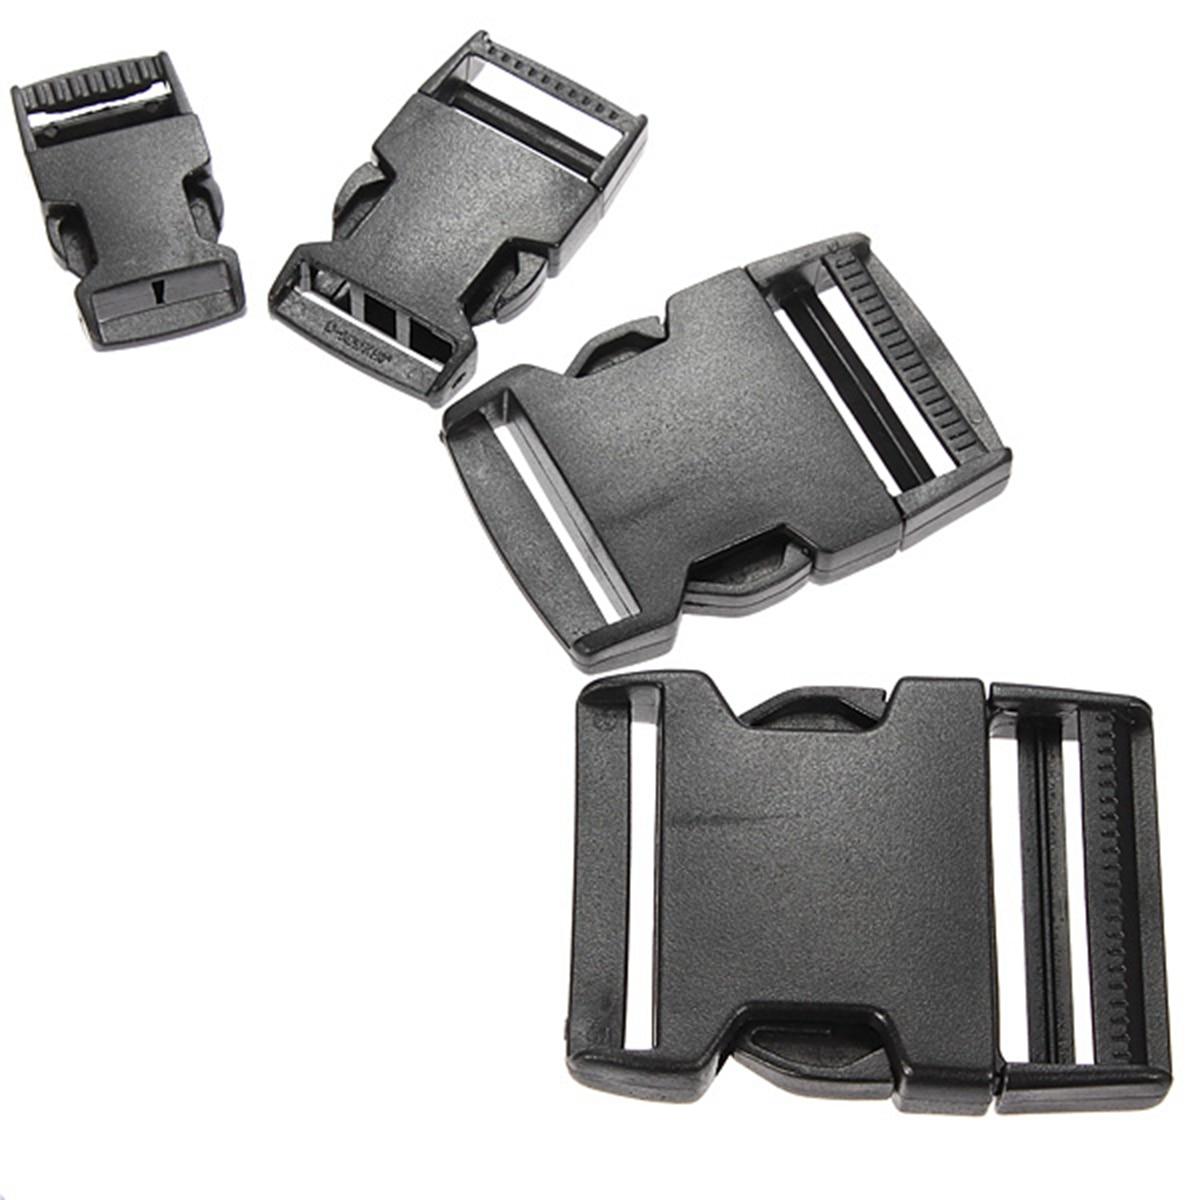 5PCS 20/25/40/50mm Contoured Curved For Paracord Bracelet & Dog Harness Plastic Buckle Black Webbing Buckle Bag Accessories